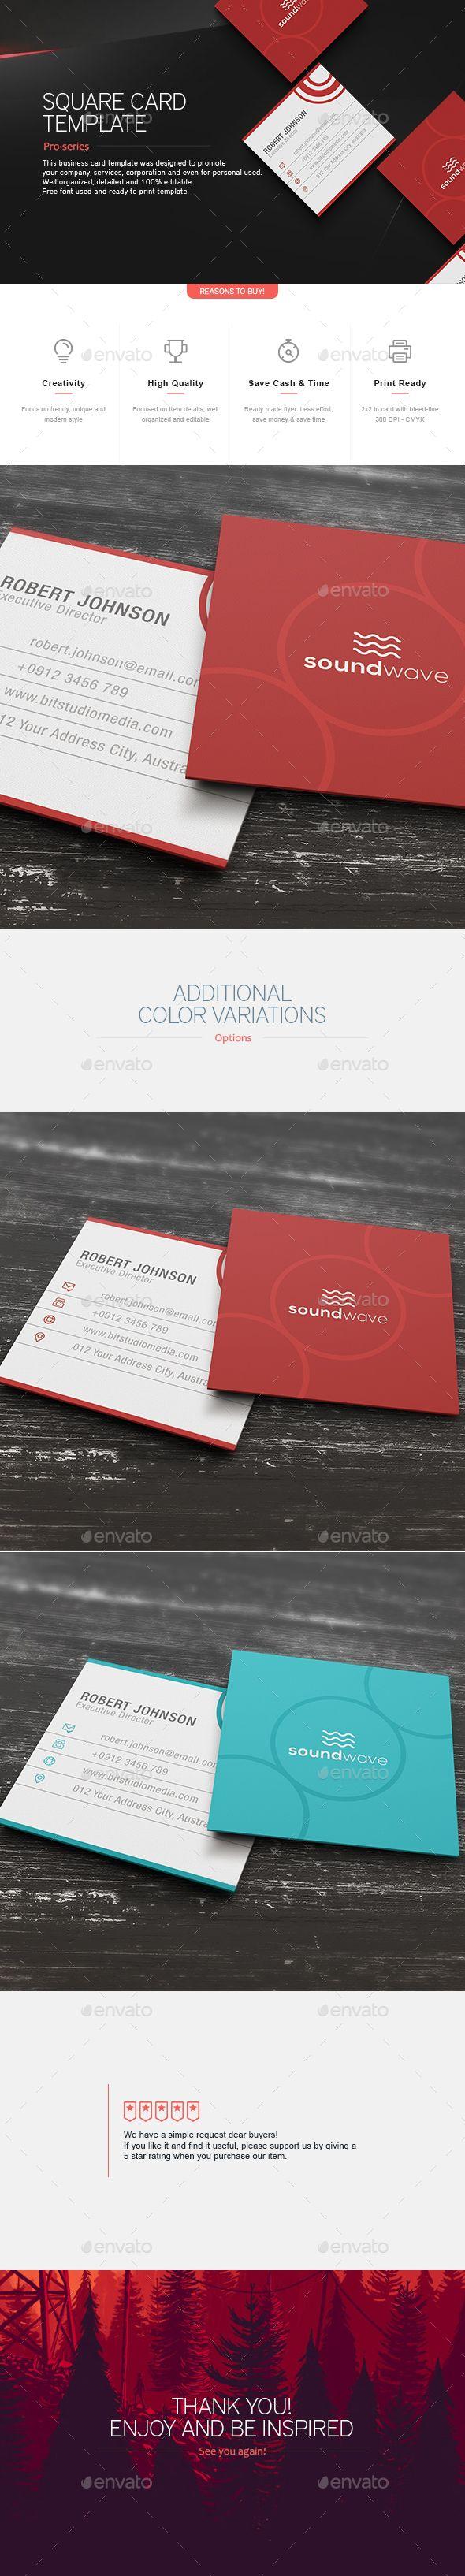 20 best tarjetas de presentacion images on pinterest